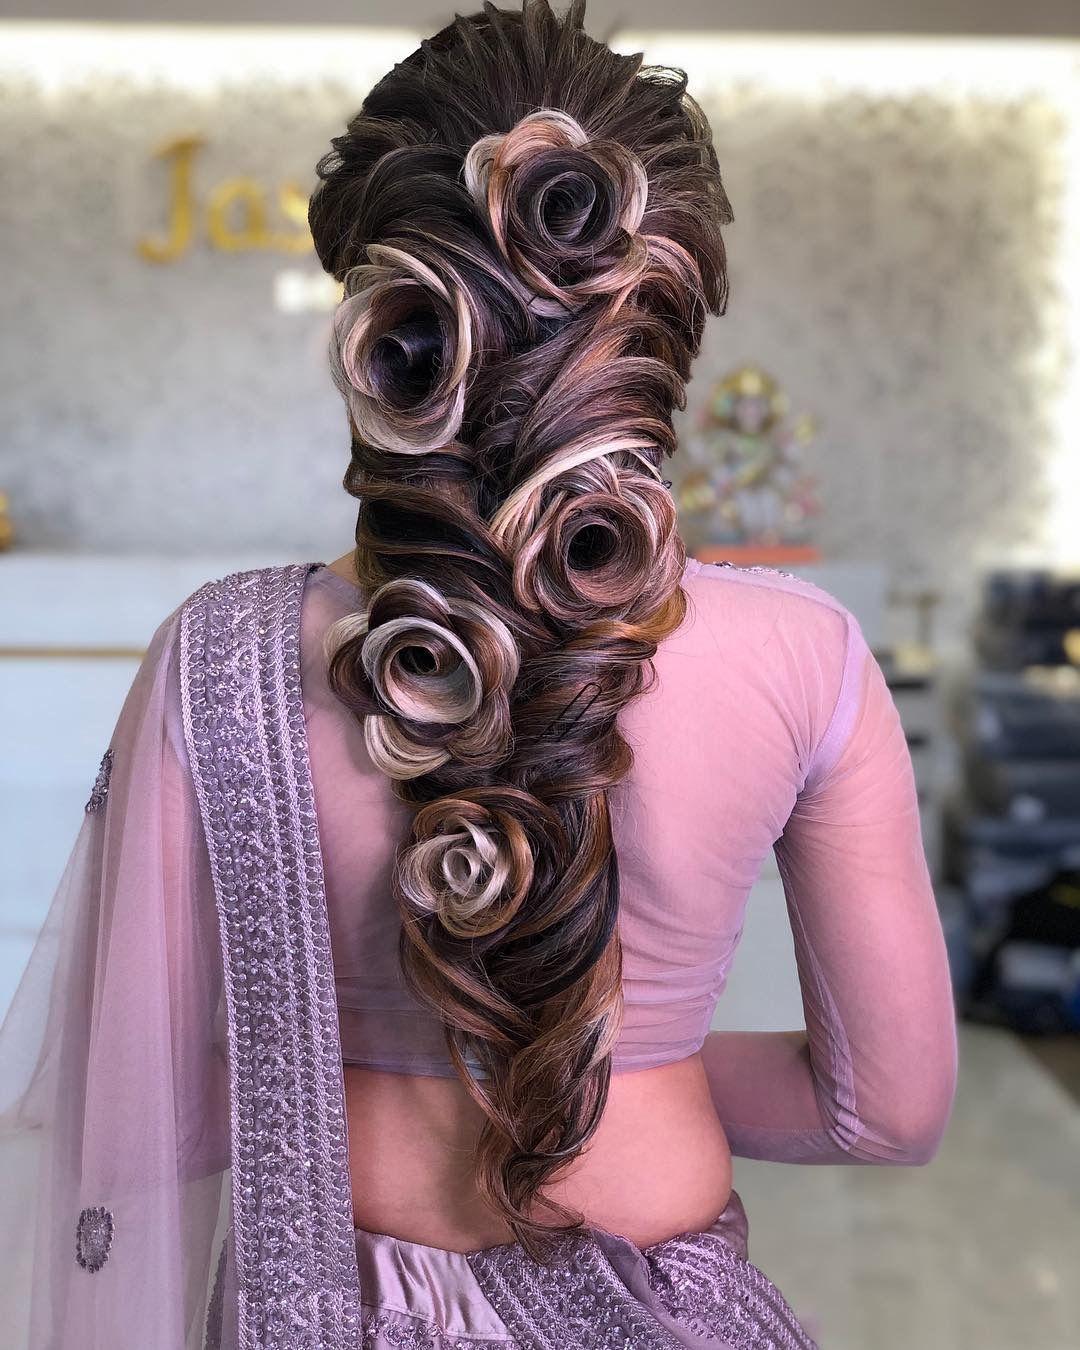 Glam Hairstyle Hair Styles Wedding Hair Inspiration Long Hair Styles